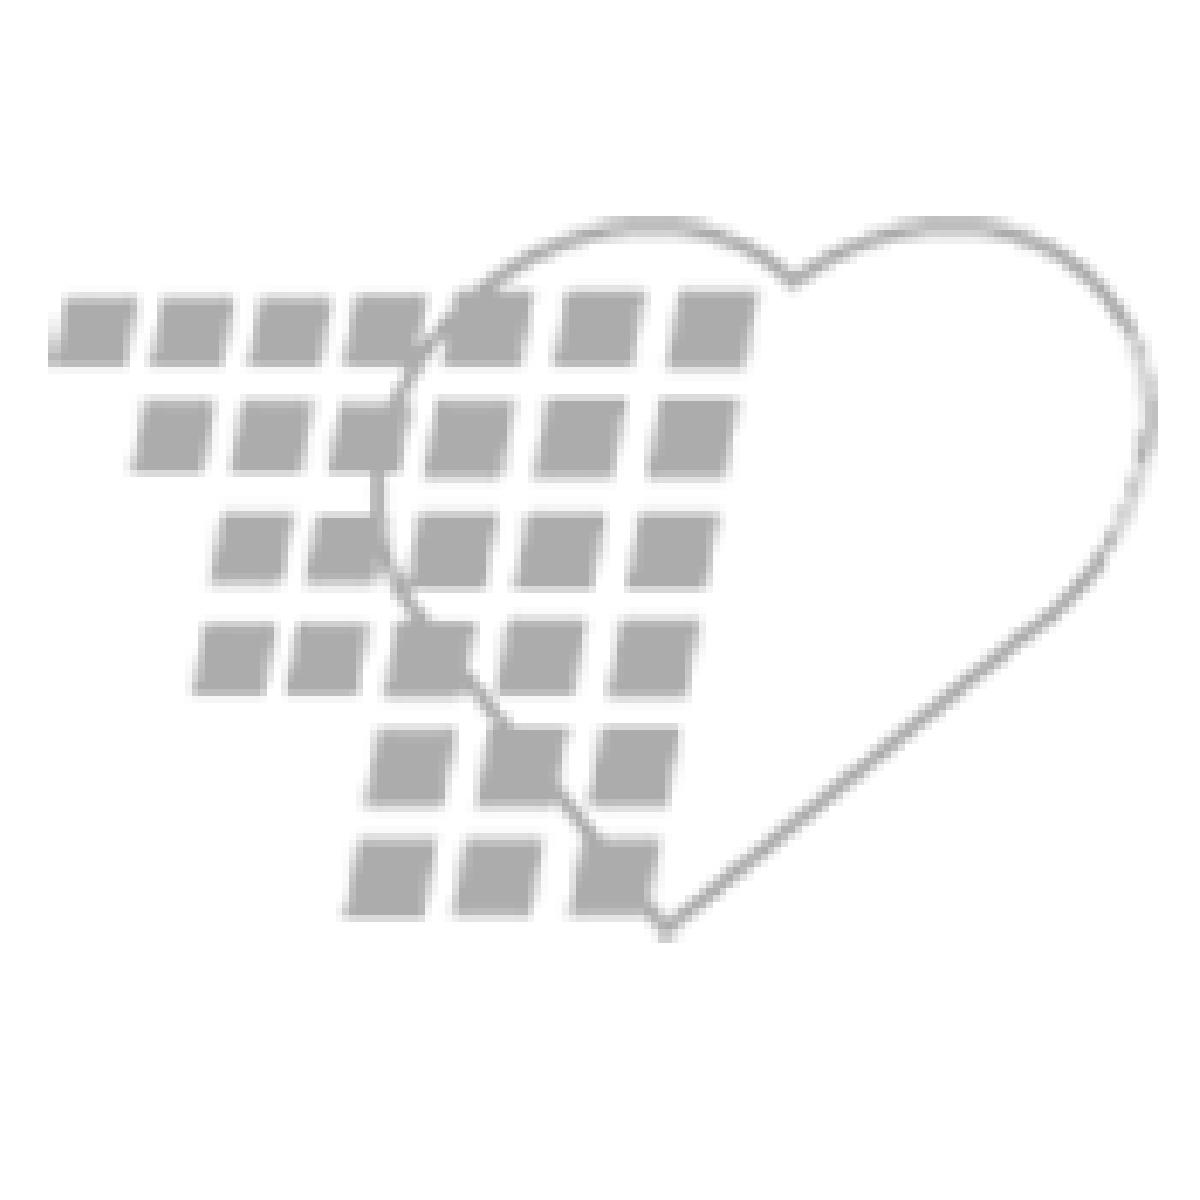 "06-26-2232 - Terumo Surshield® Safety IV Catheter 22g x 1 1/4""- Blue"